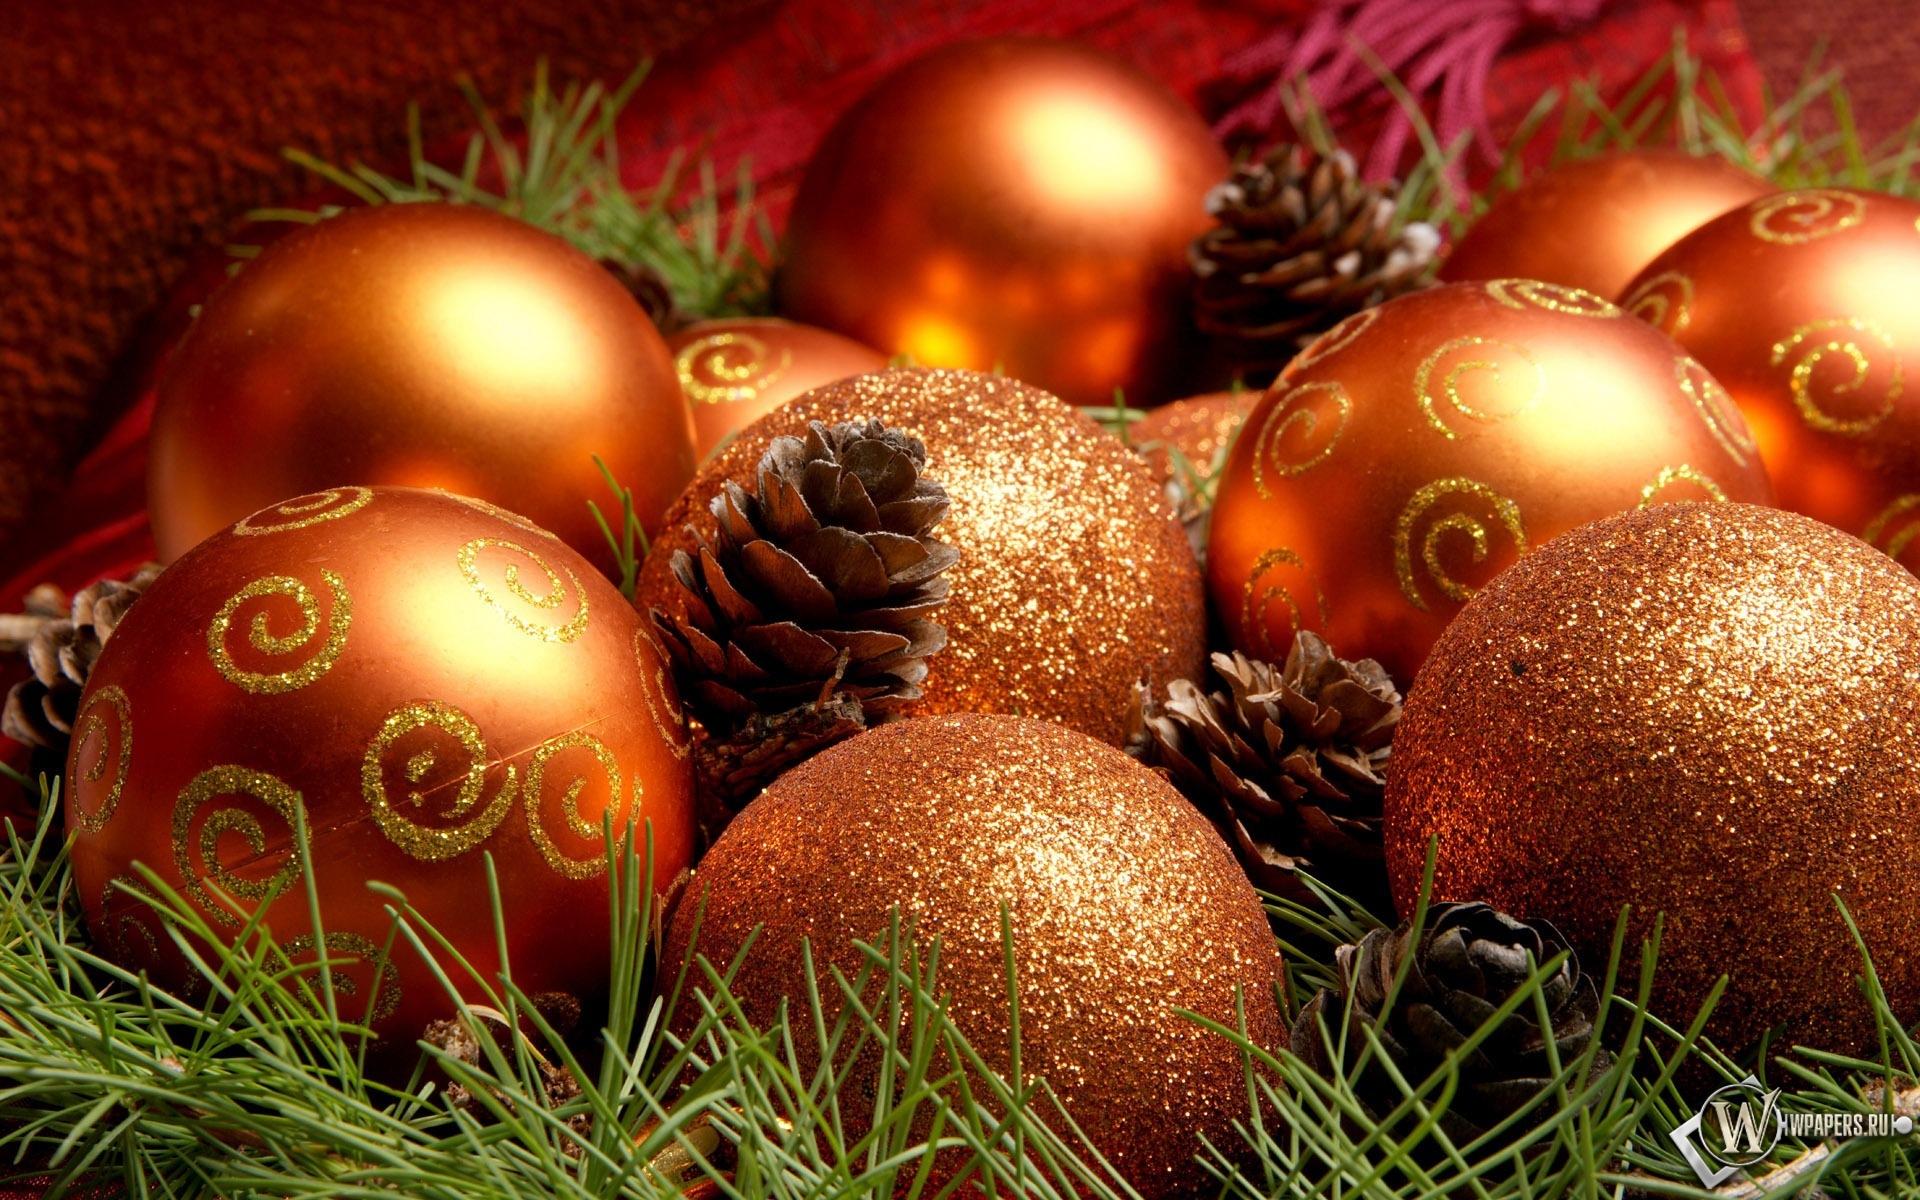 Рождественские шарики 1920x1200